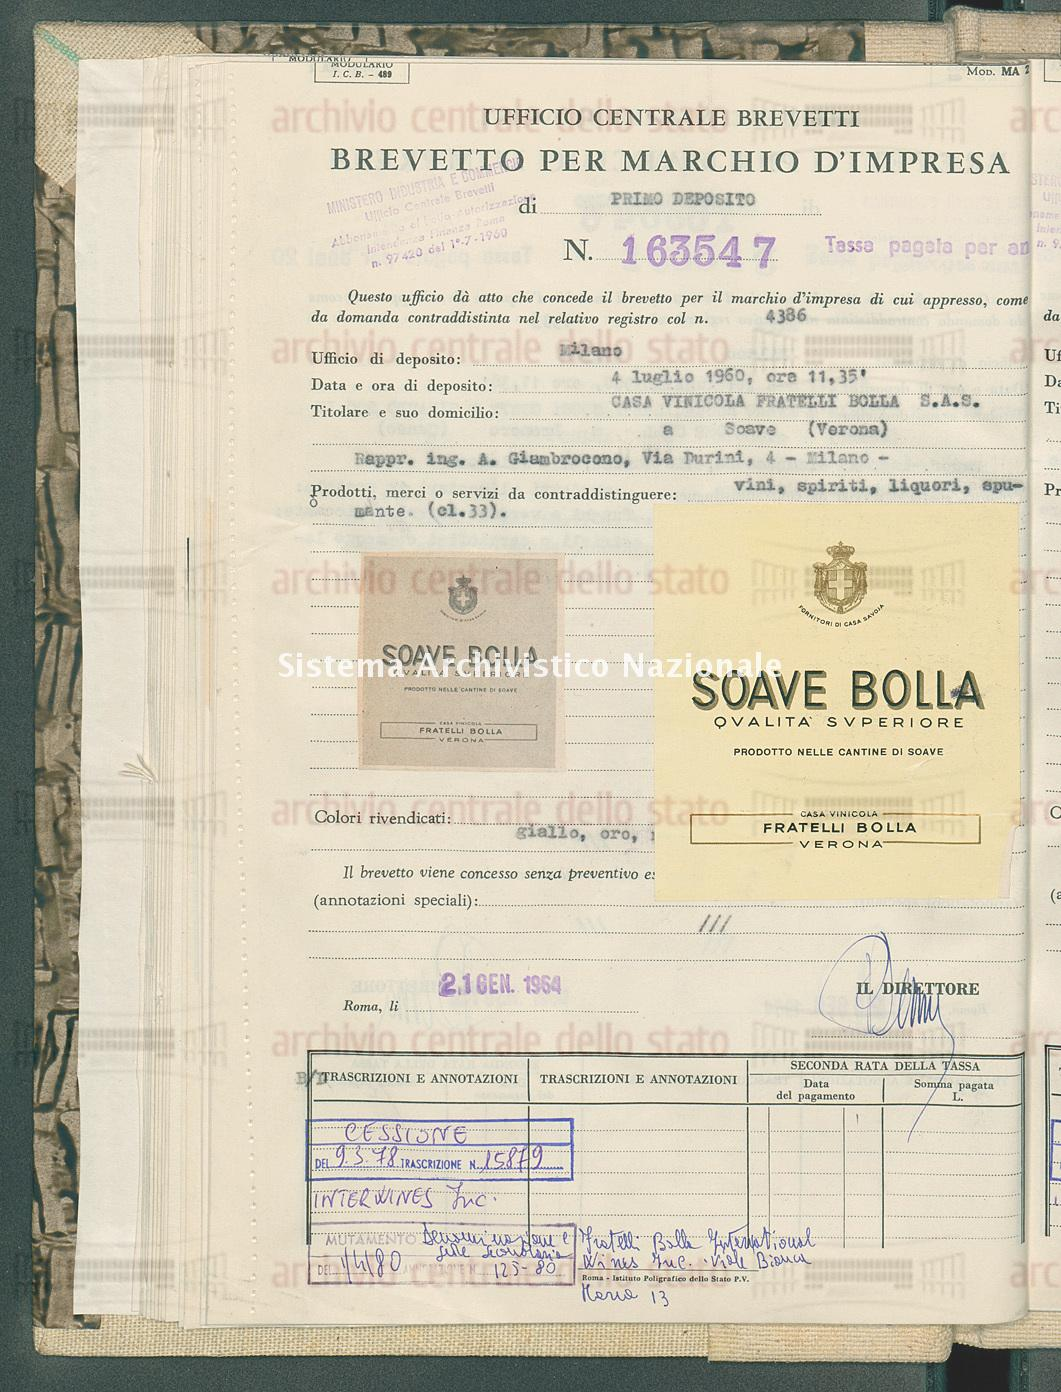 Vini, spiriti, liquori ecc. Casa Vinicola Fratelli Bolla S.A.S. (21/01/1964)